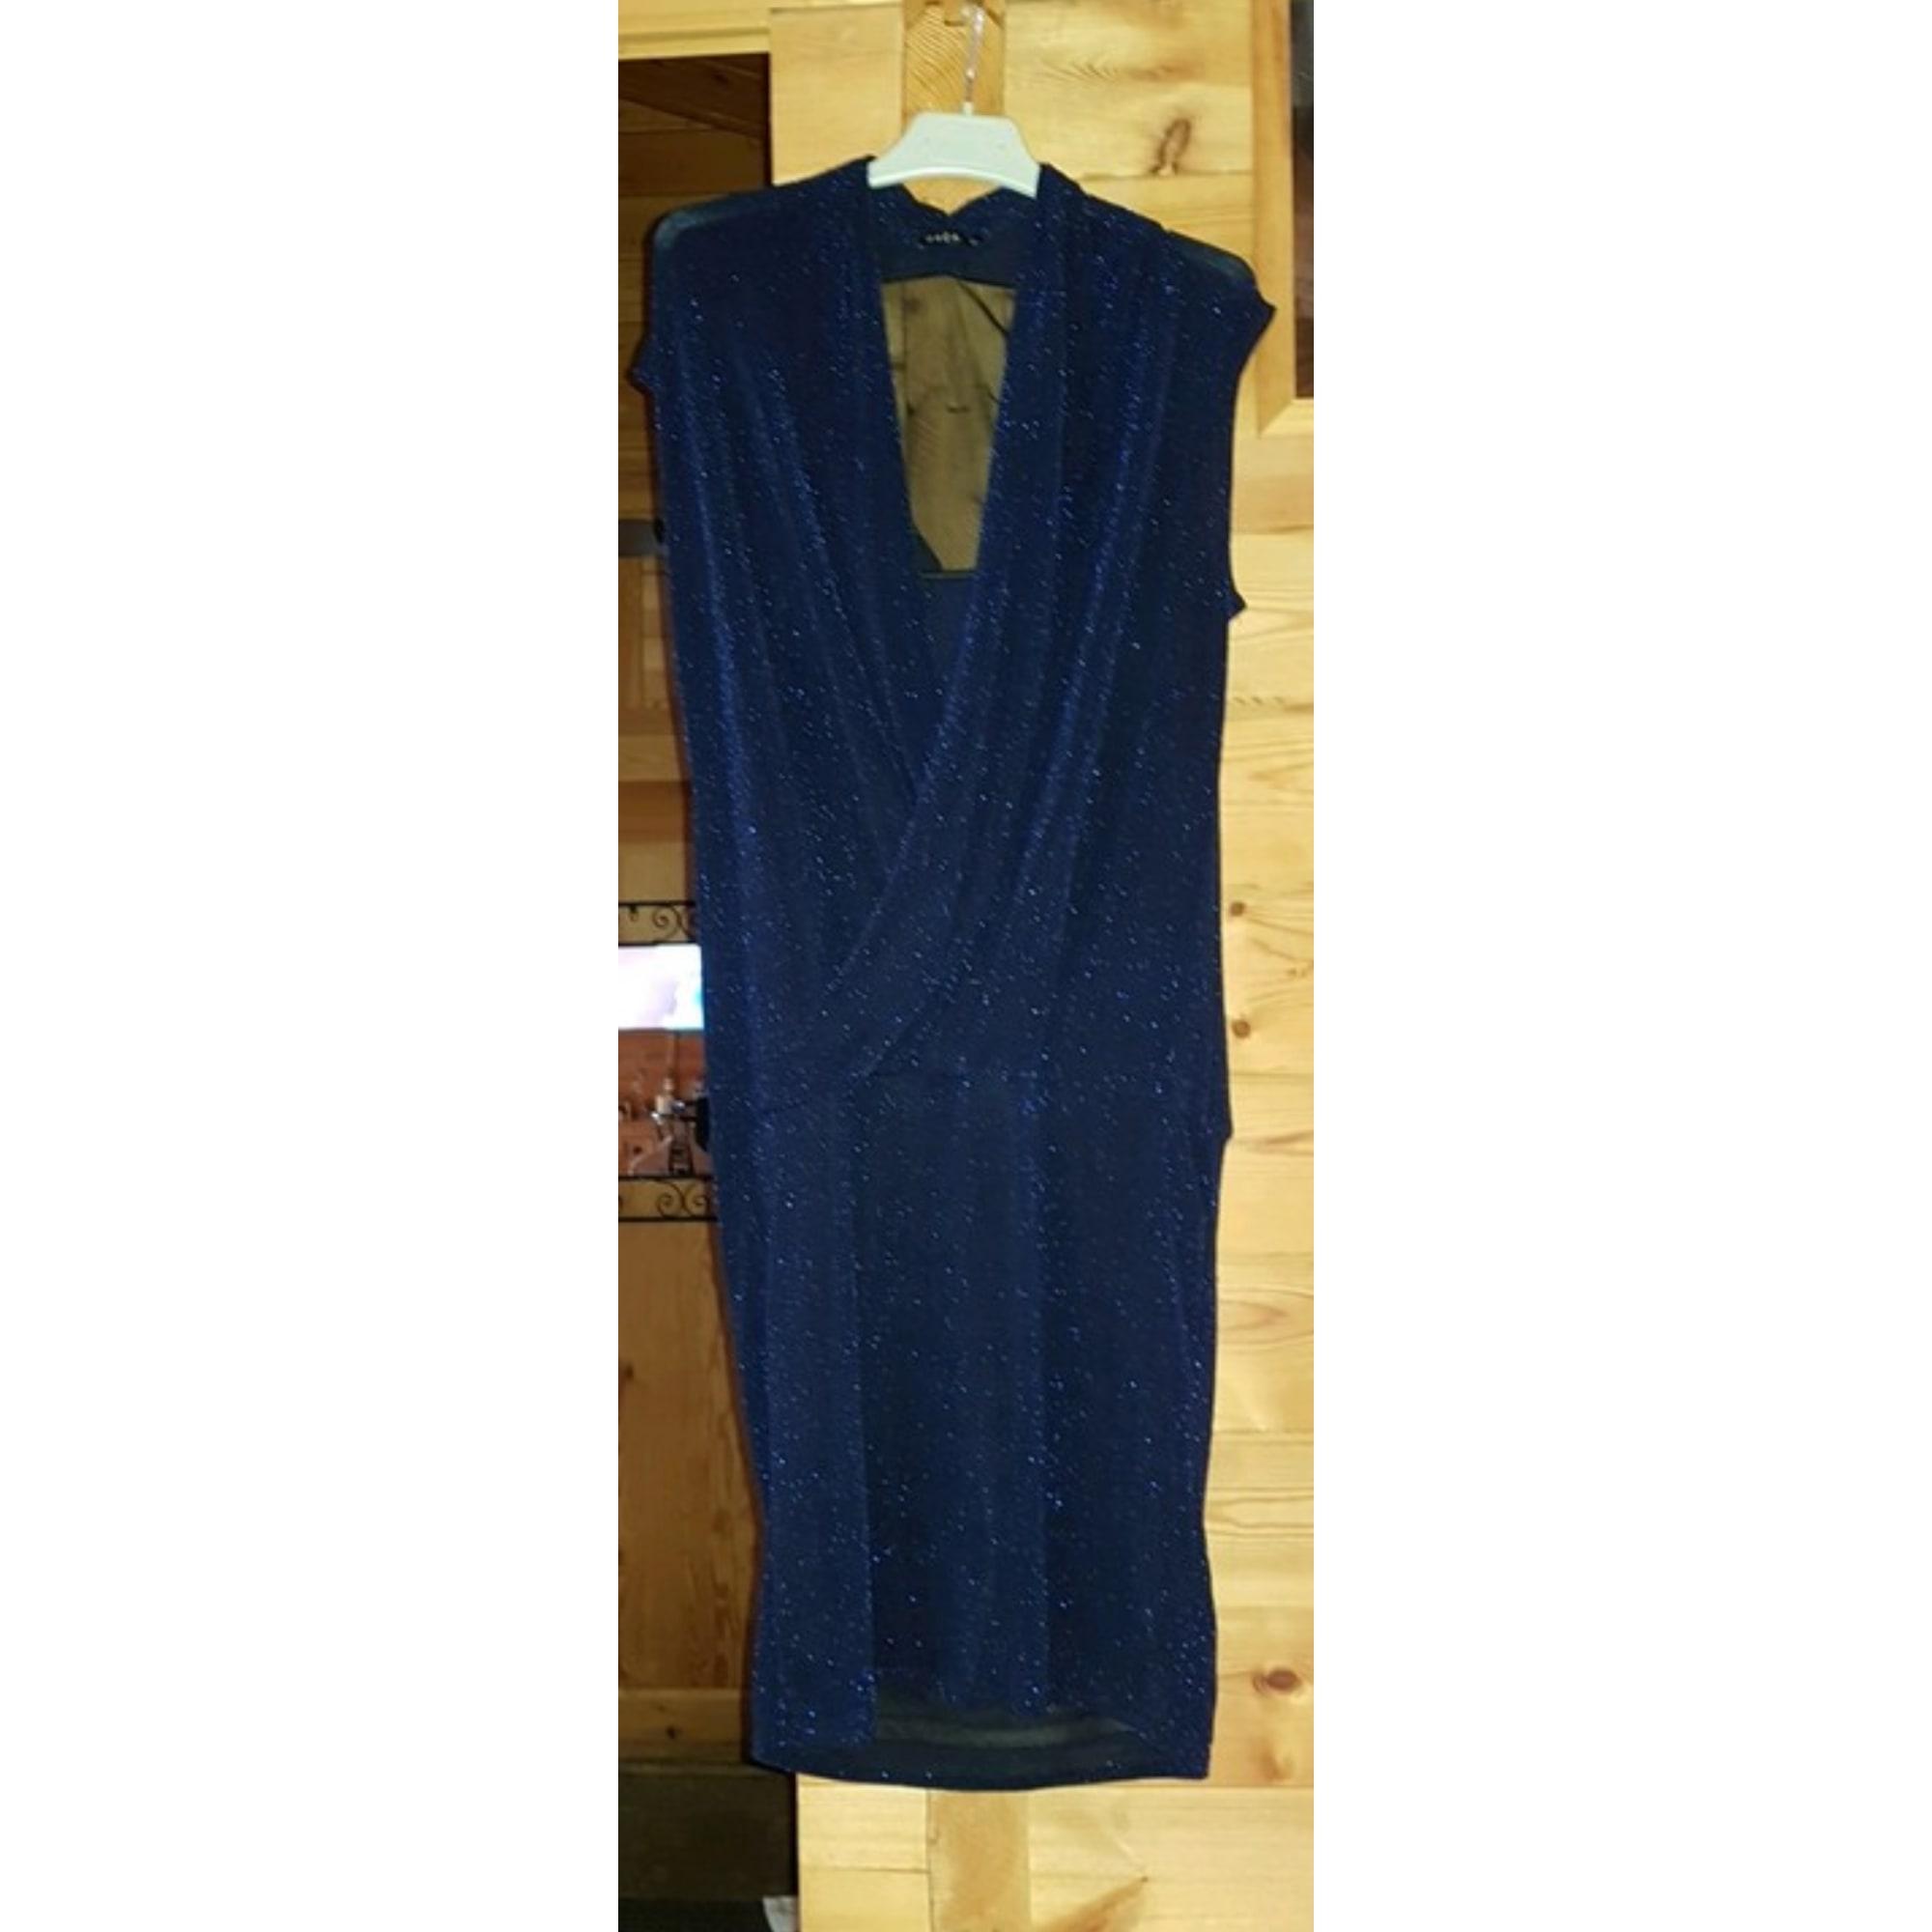 Robe bleu marine patrice breal